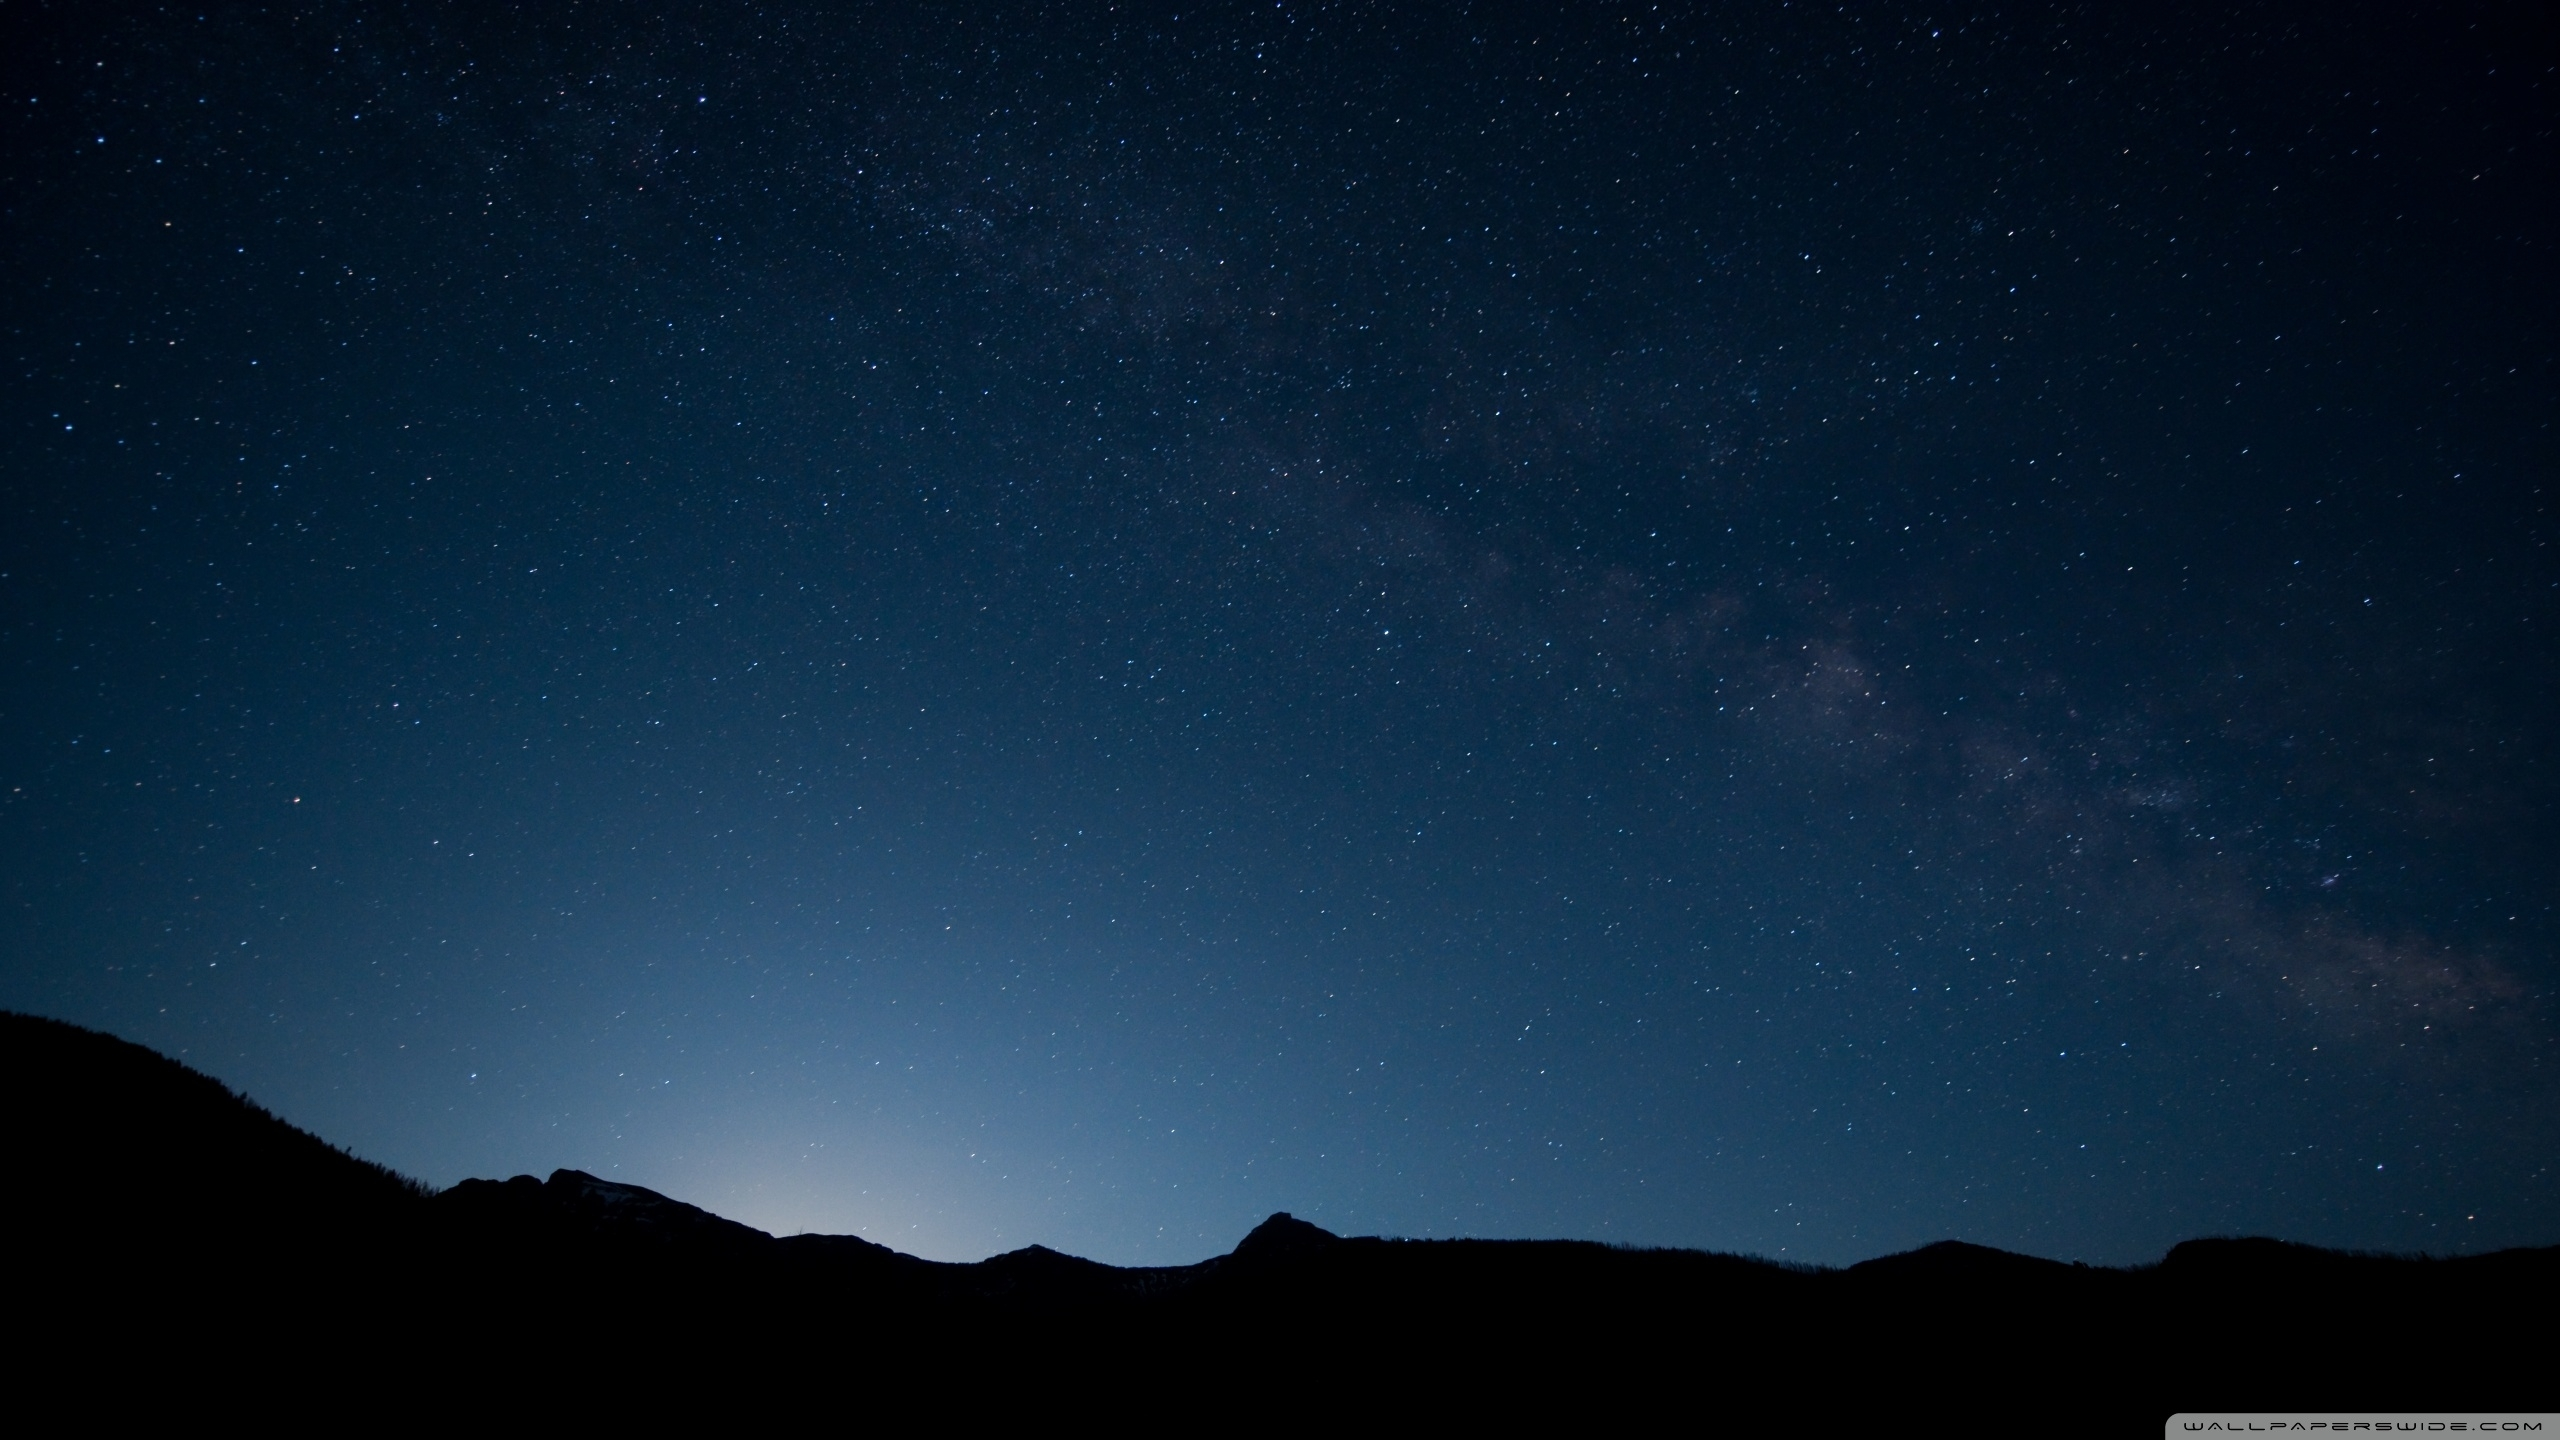 10 most popular hd night sky wallpaper full hd 1080p for